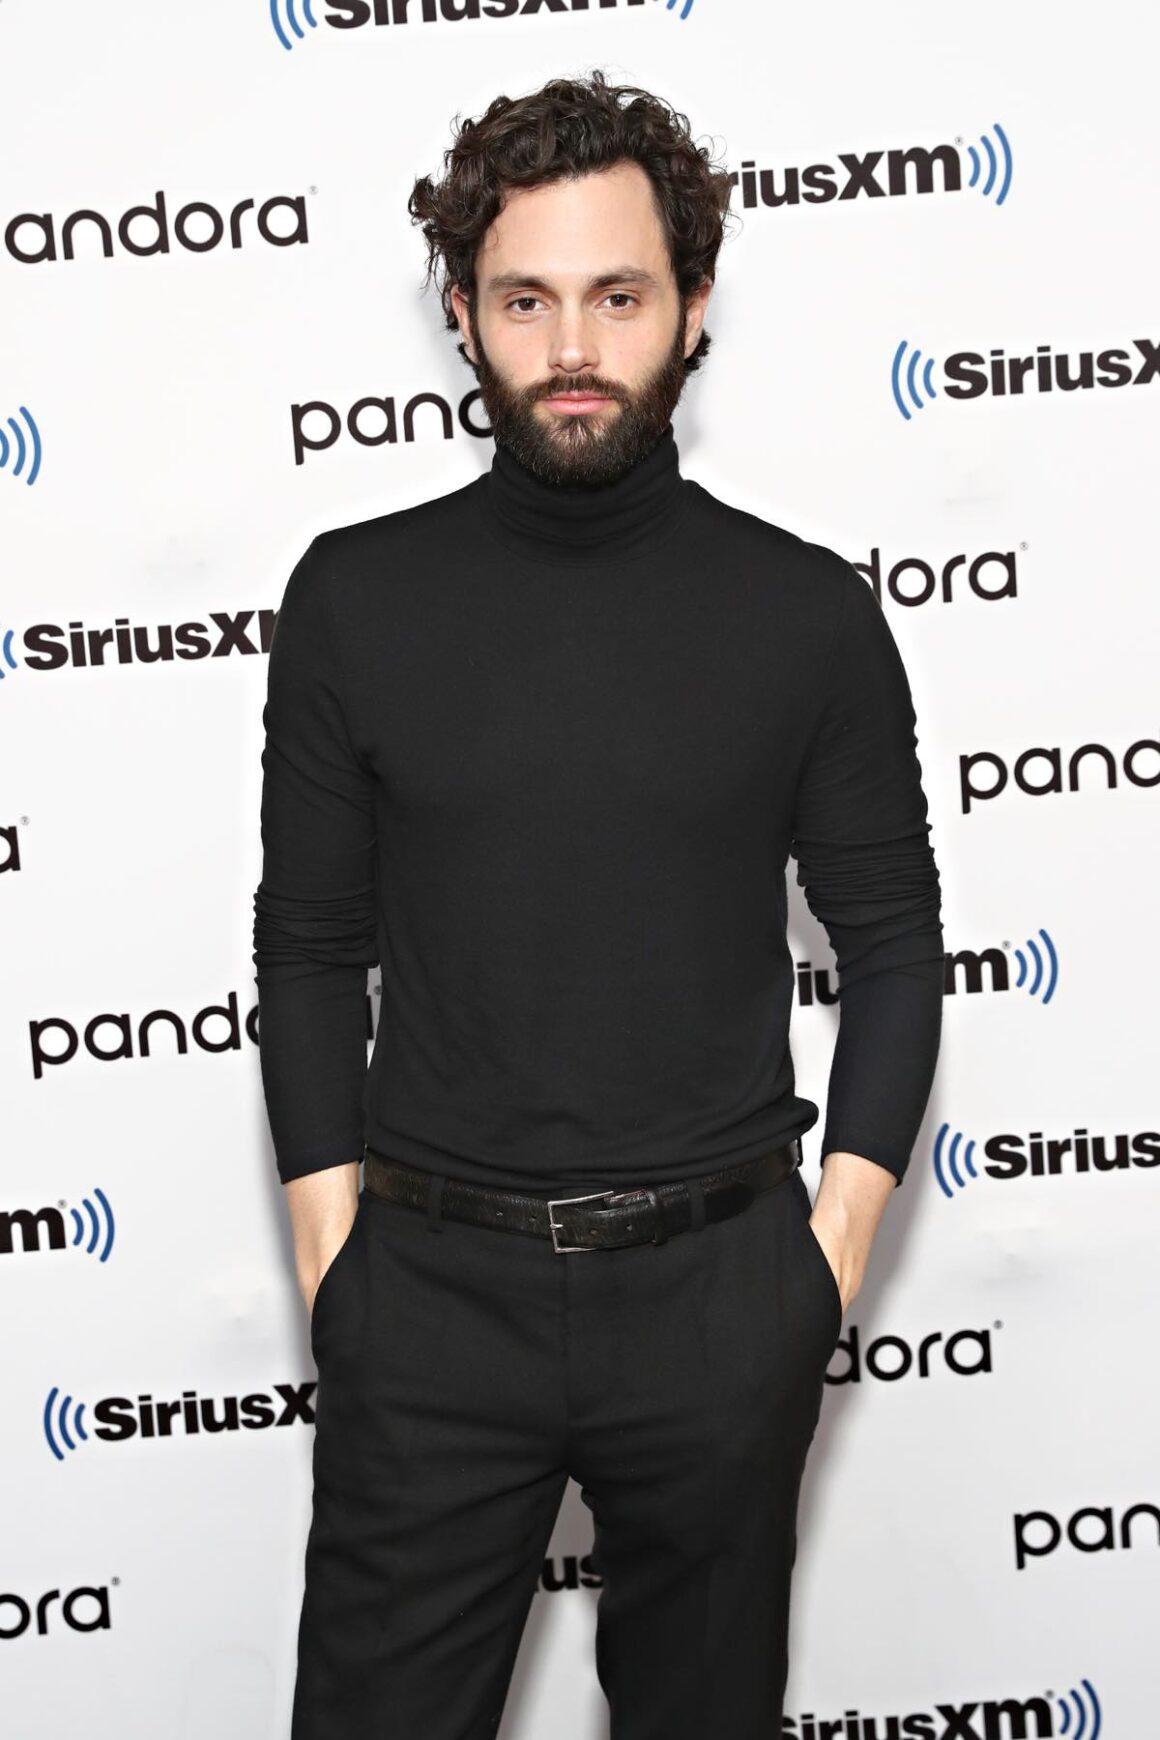 Penn Badgley Celebrities Visit SiriusXM - January 8, 2020